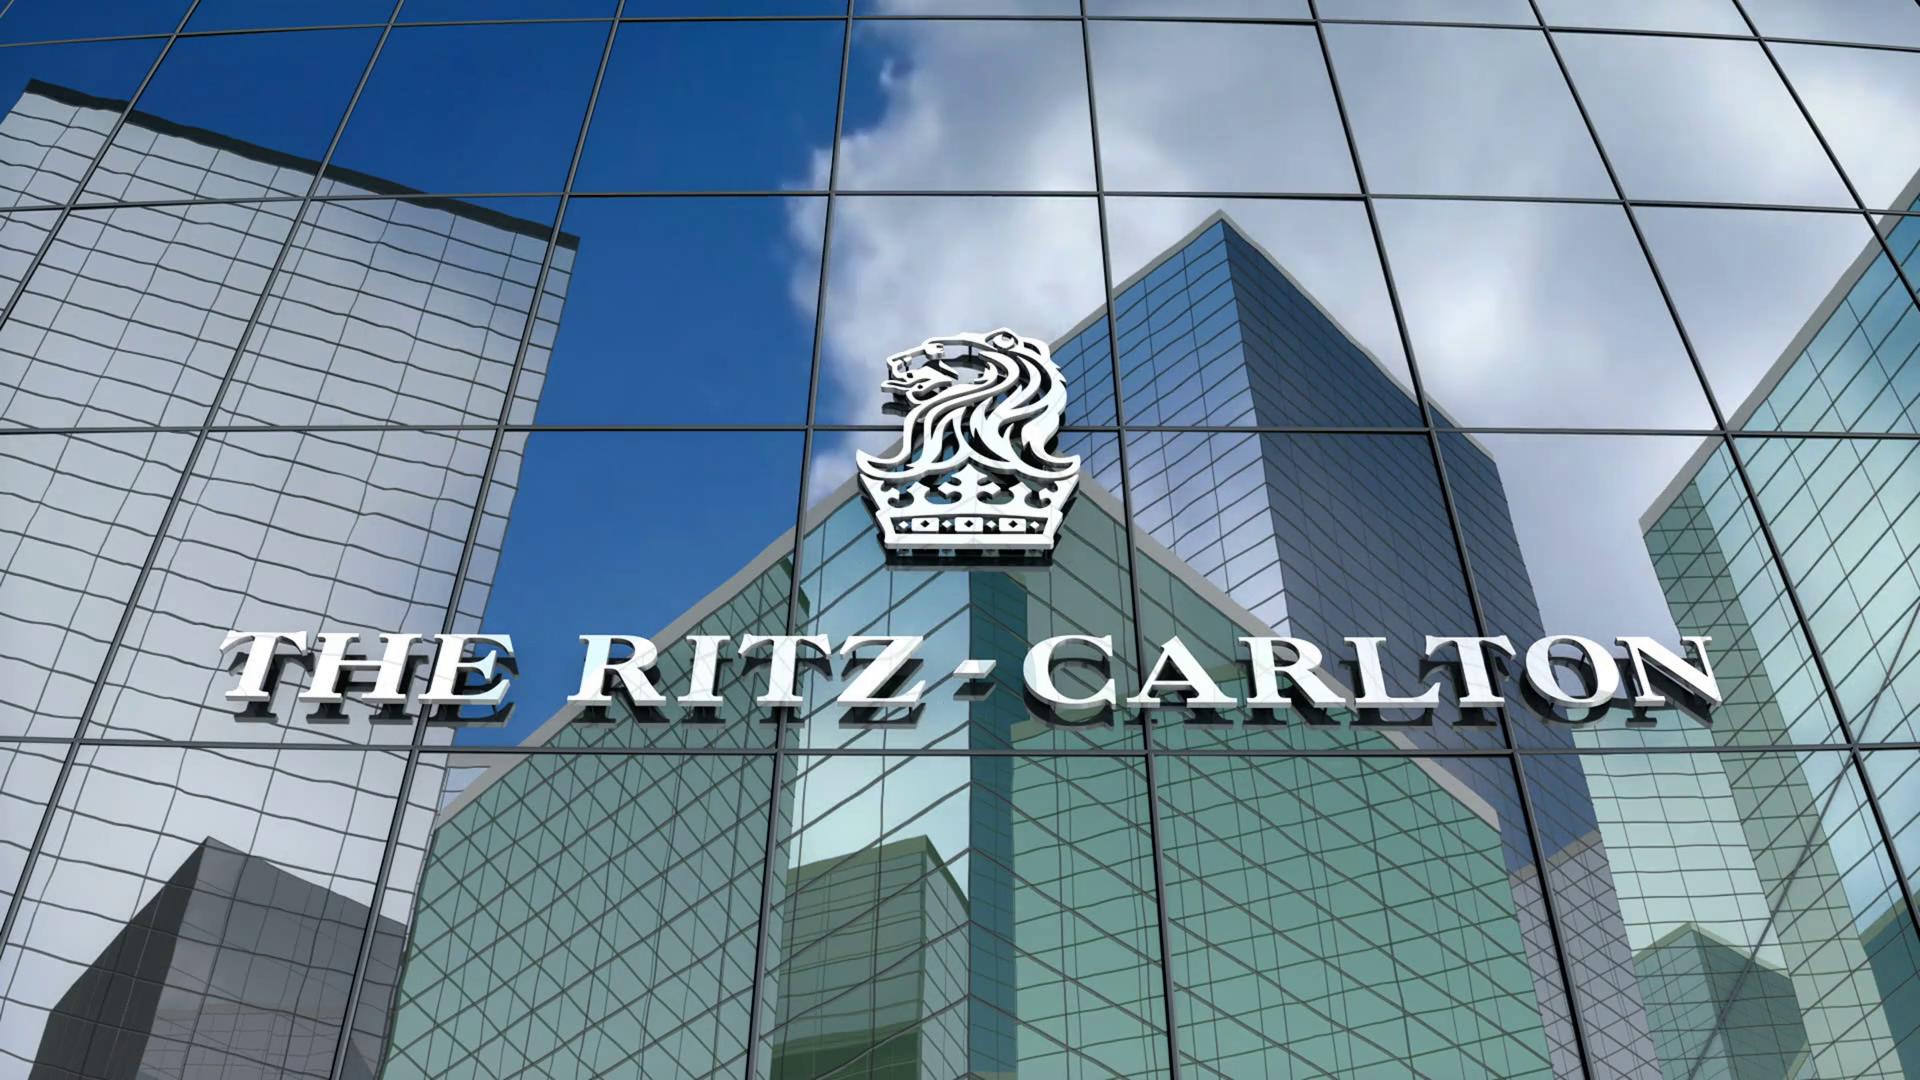 Editorial, The Ritz.